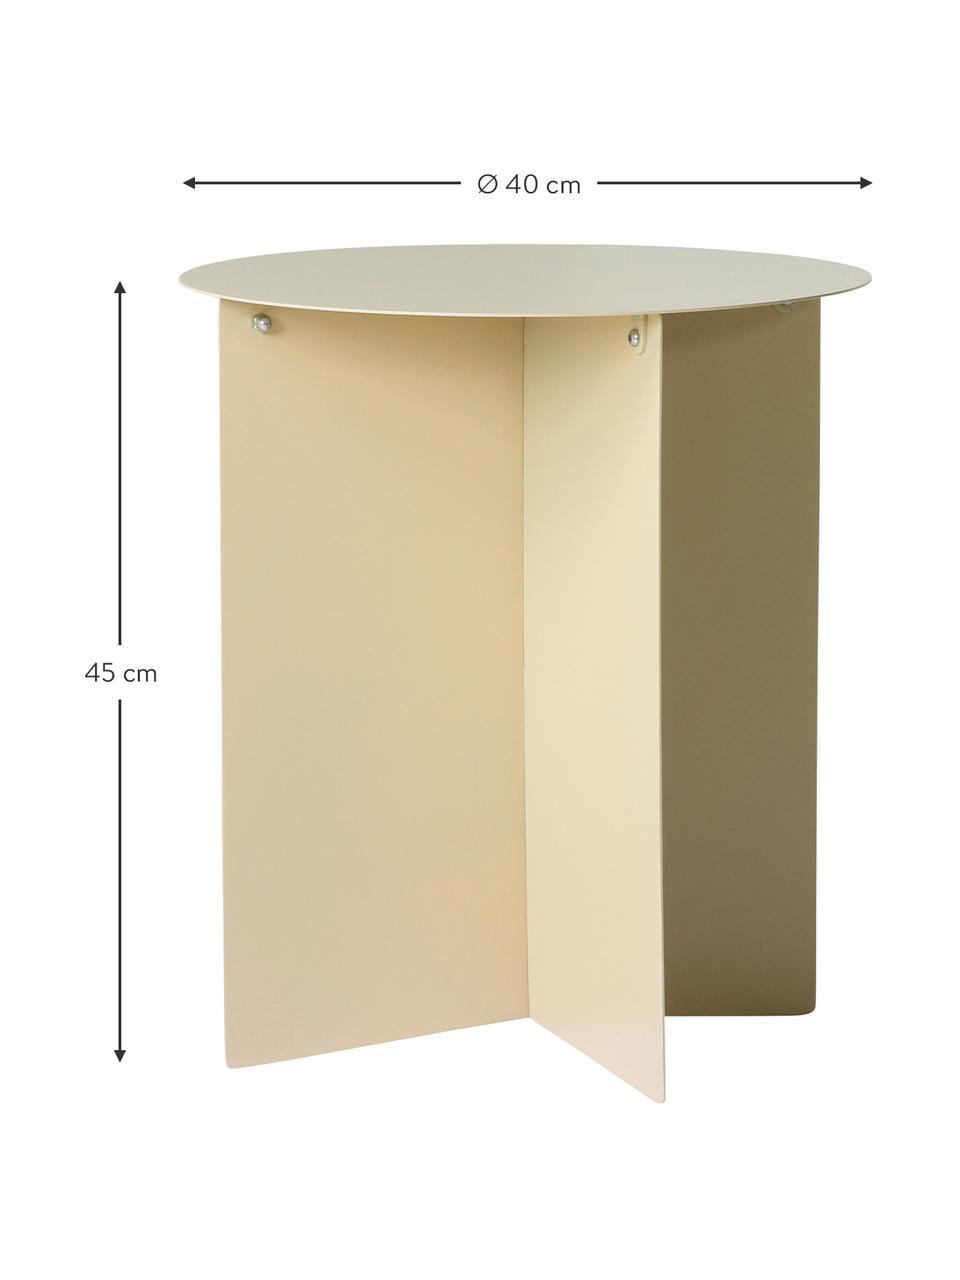 Tavolino da salotto color crema Dinga, Metallo verniciato a polvere, Color crema, Ø 40 x Alt. 45 cm